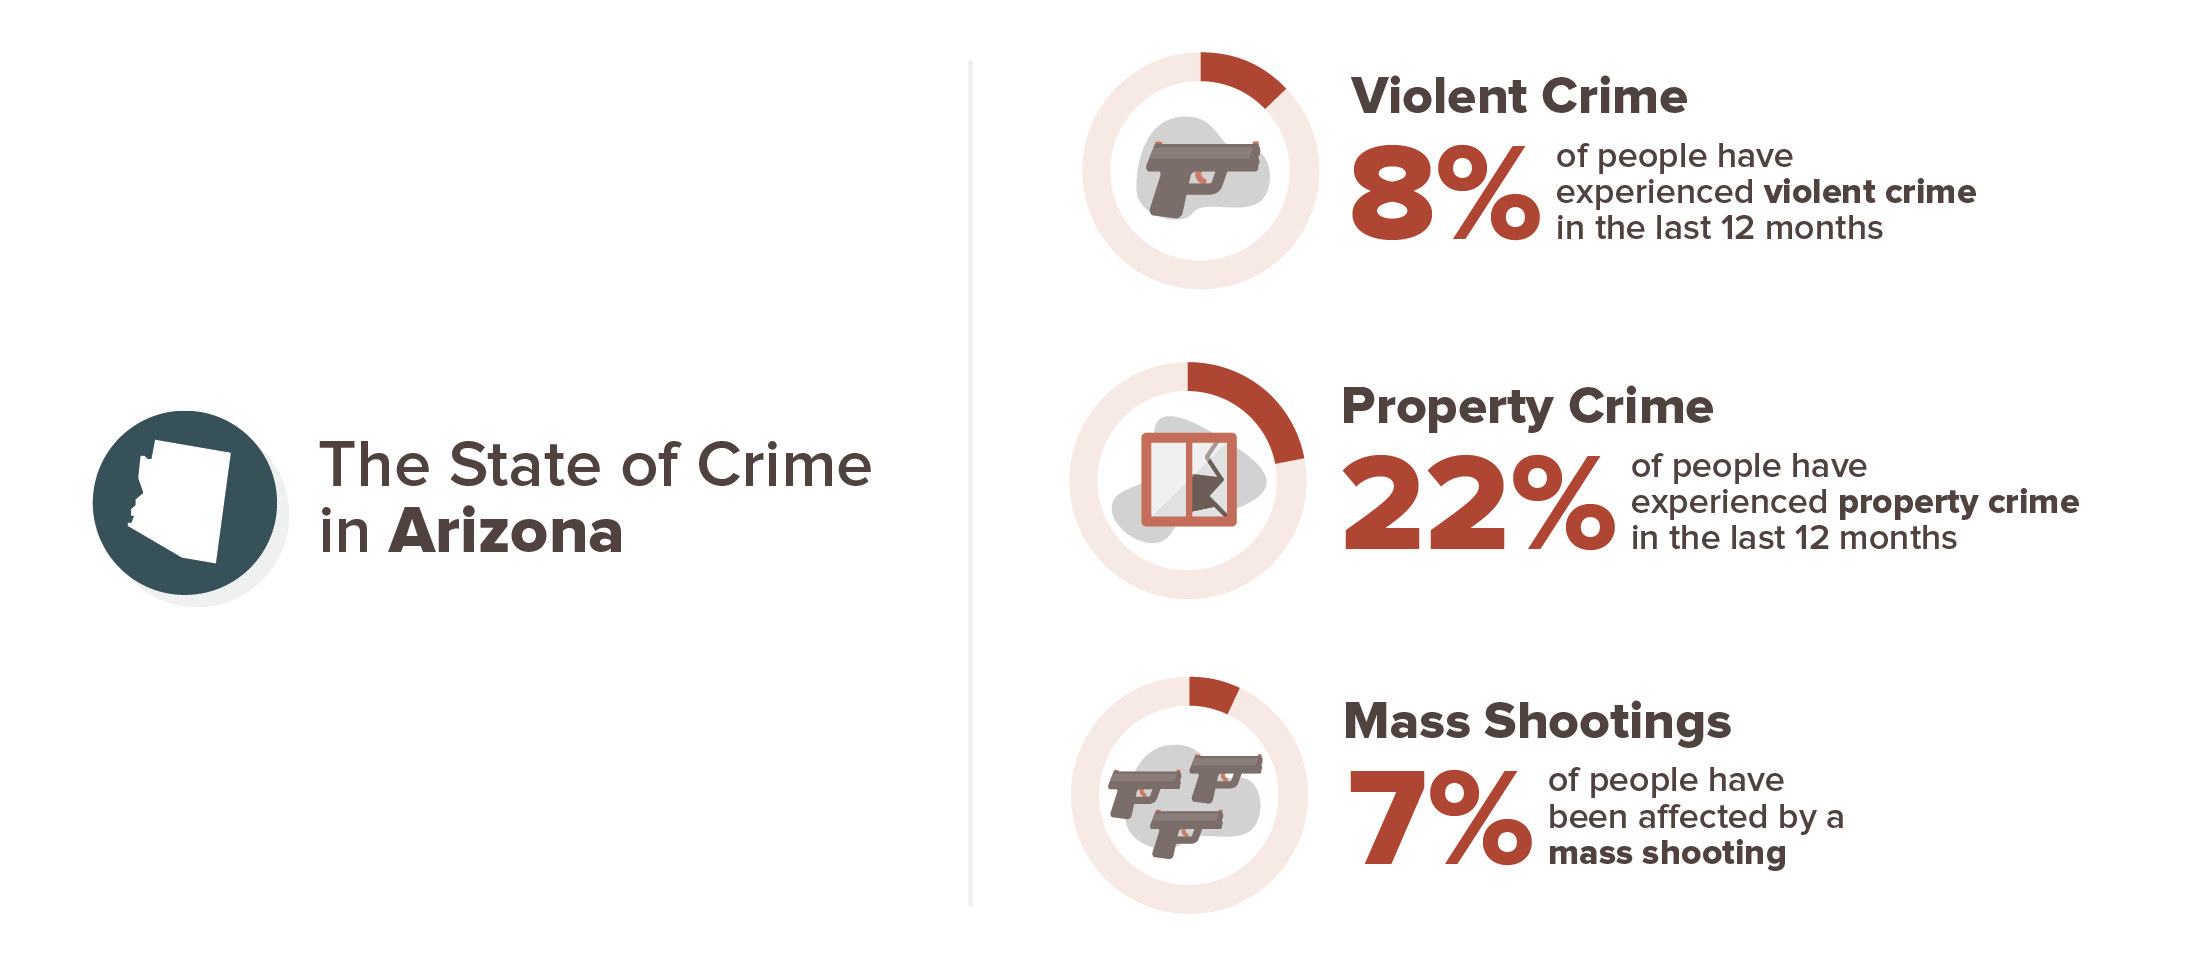 Arizona crime experience infographic; 8% violent crime, 22% property crime, 7% mass shooting